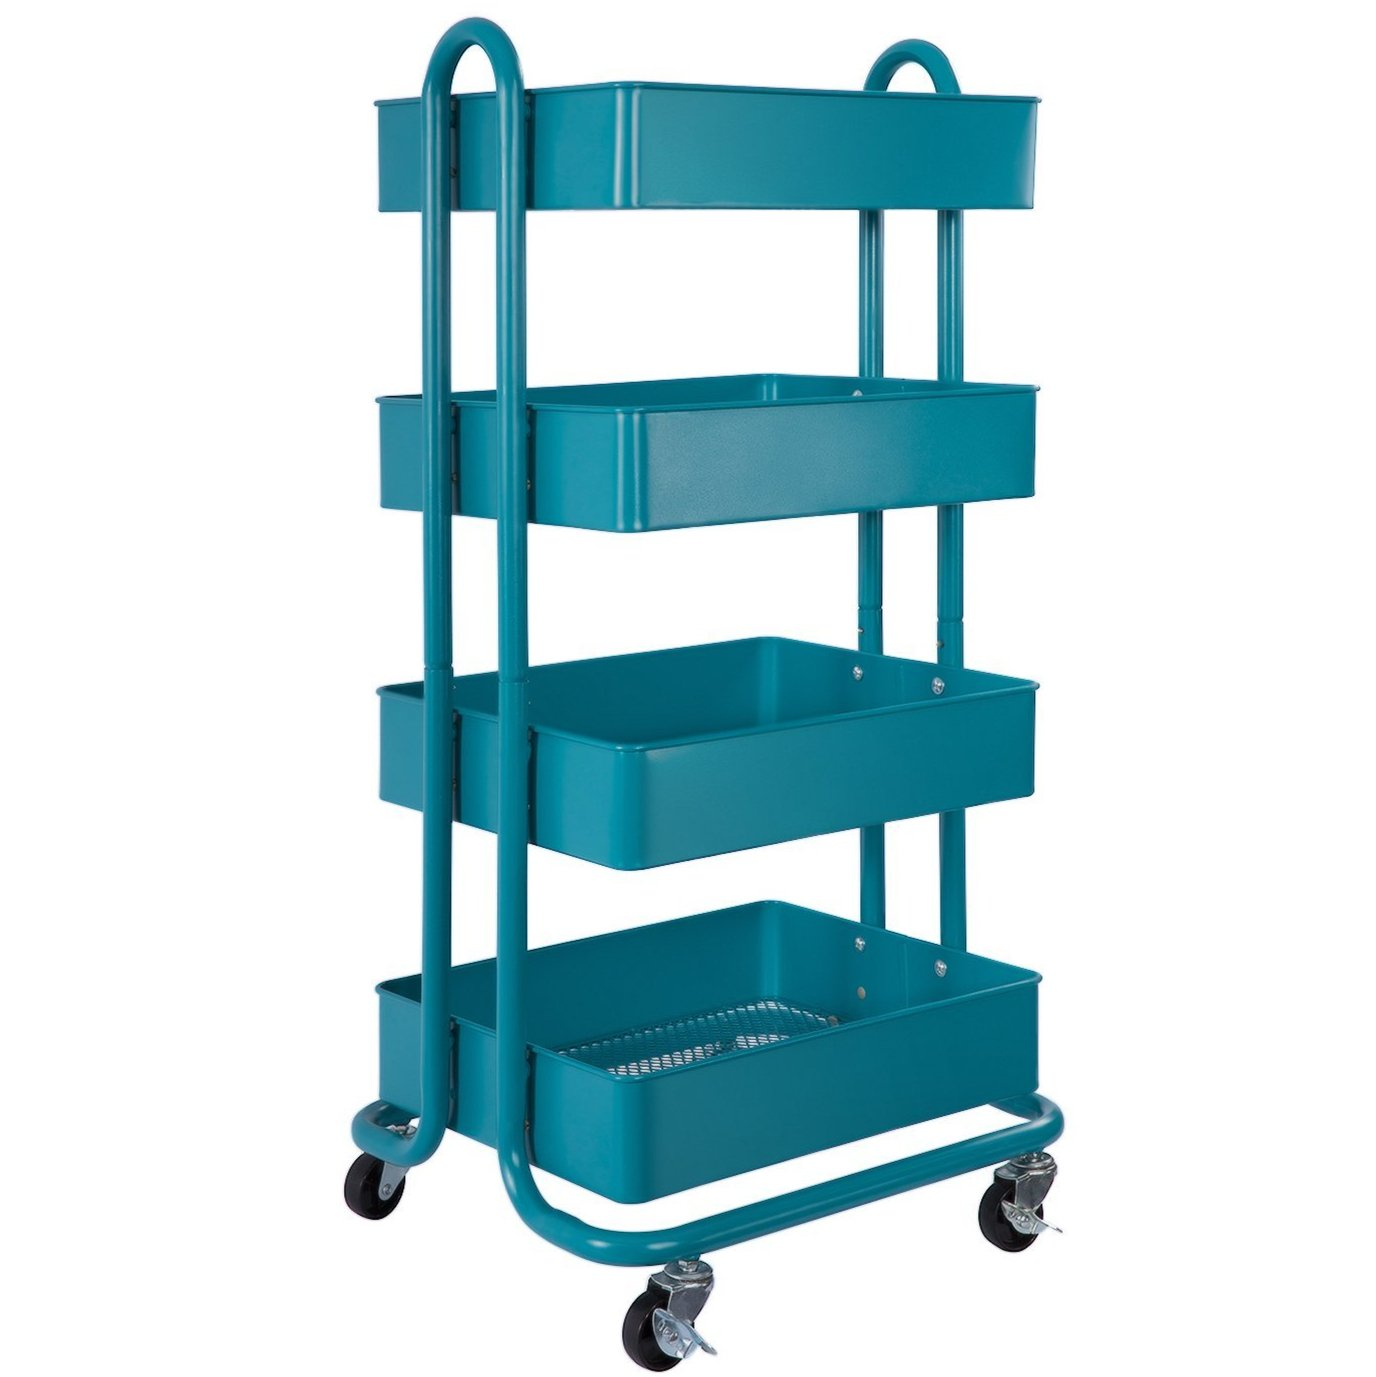 Amazon.com : DESIGNA Metal Utility Rolling Mesh Storage Organization ...